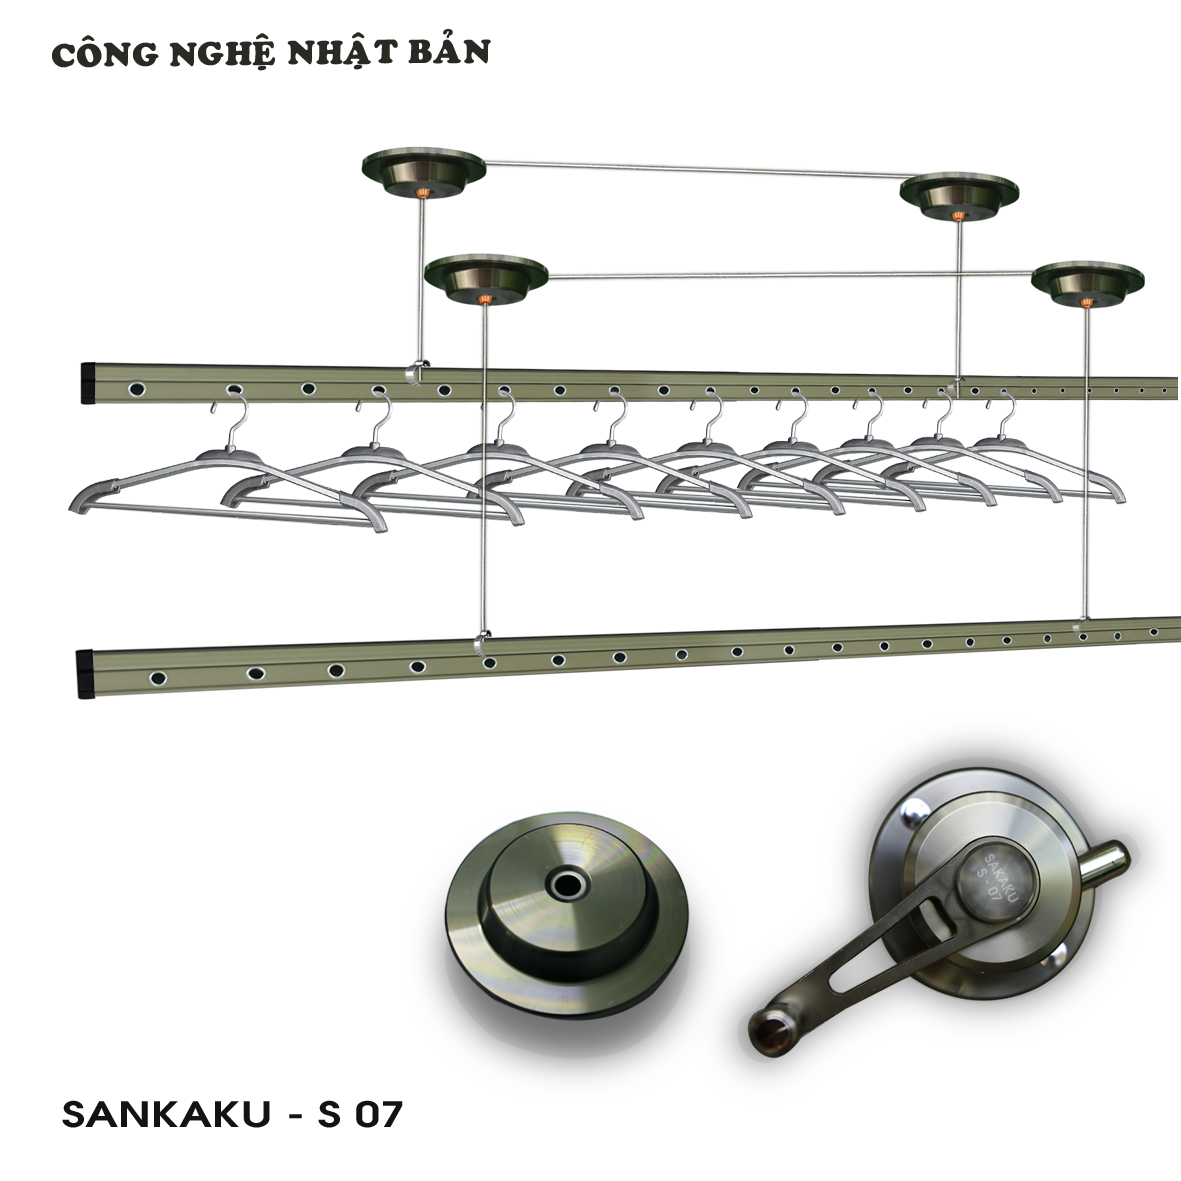 Giàn phơi nhập khẩu Sankaku S07